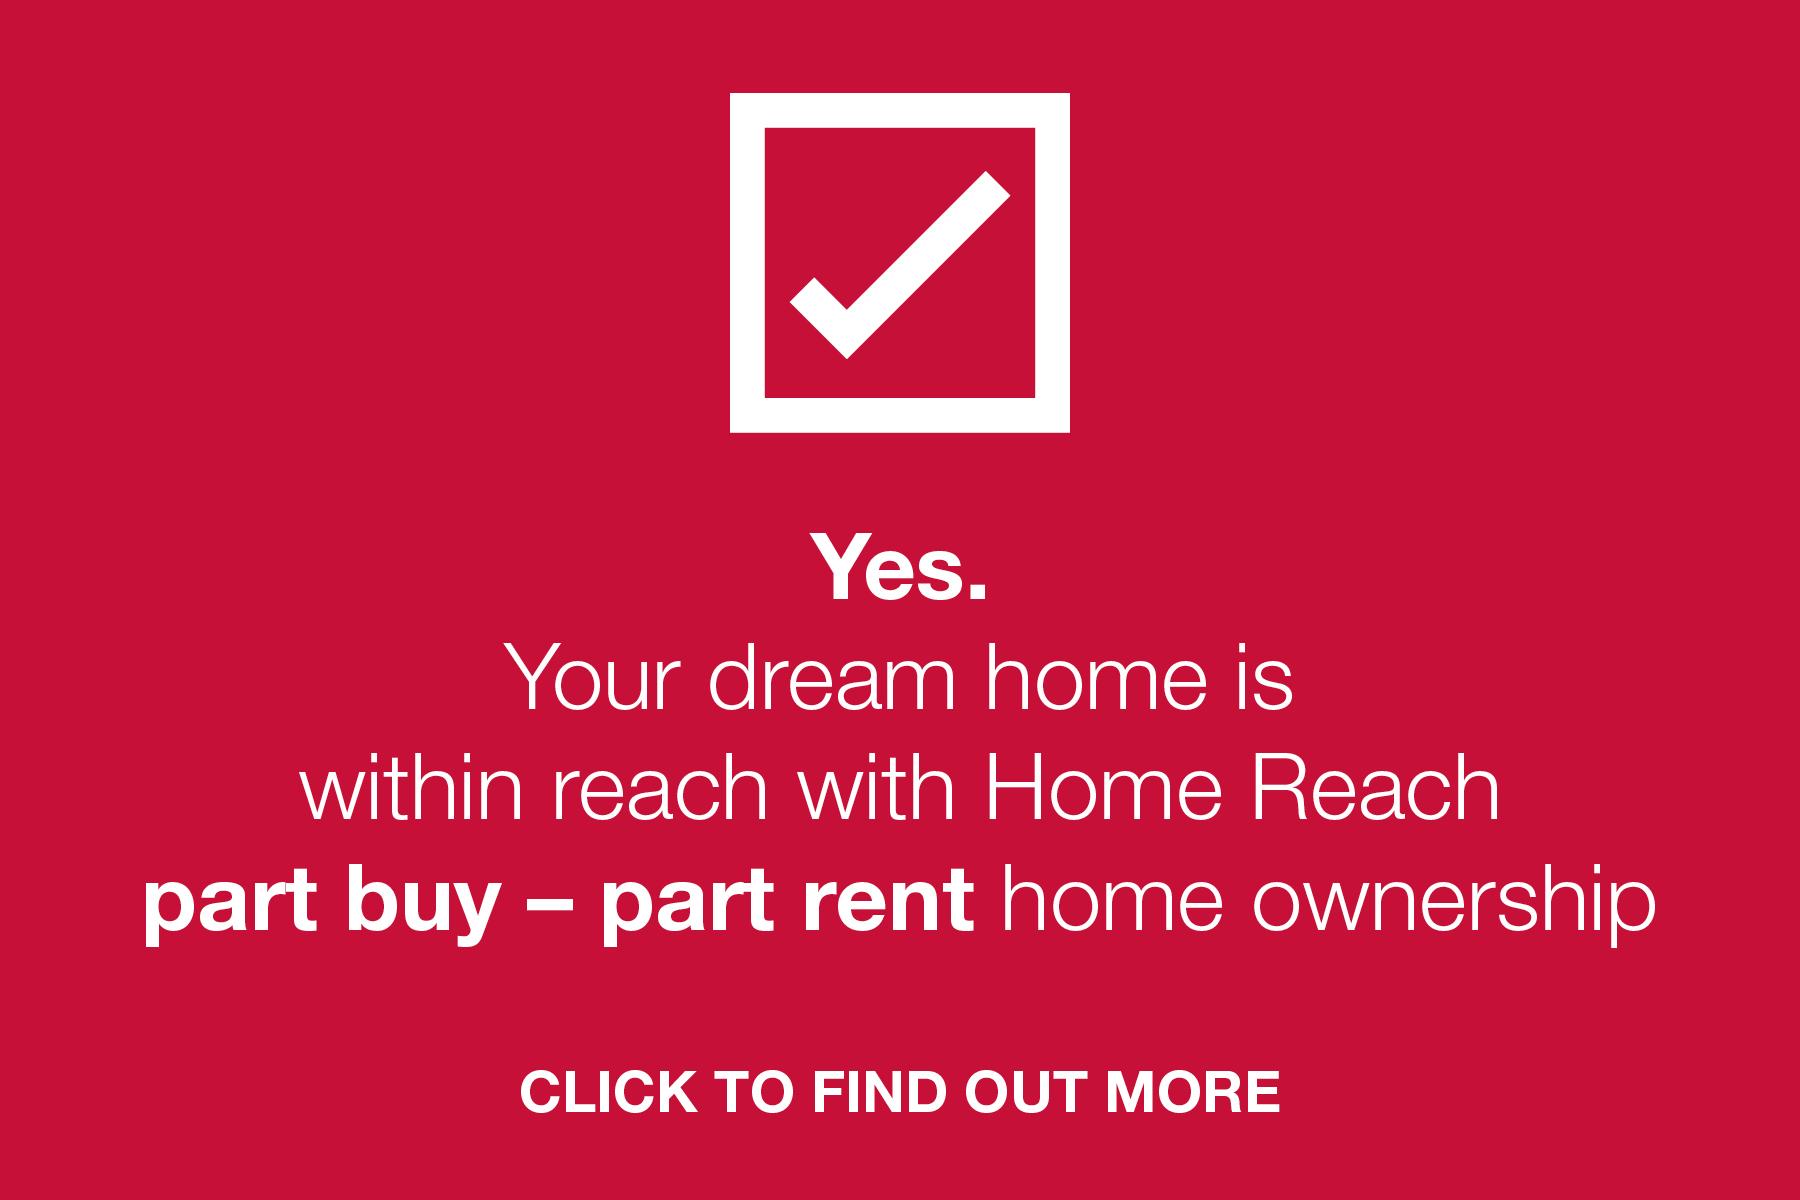 53163_TWY_Home_Reach_-_Web_Graphic_1800x1200px